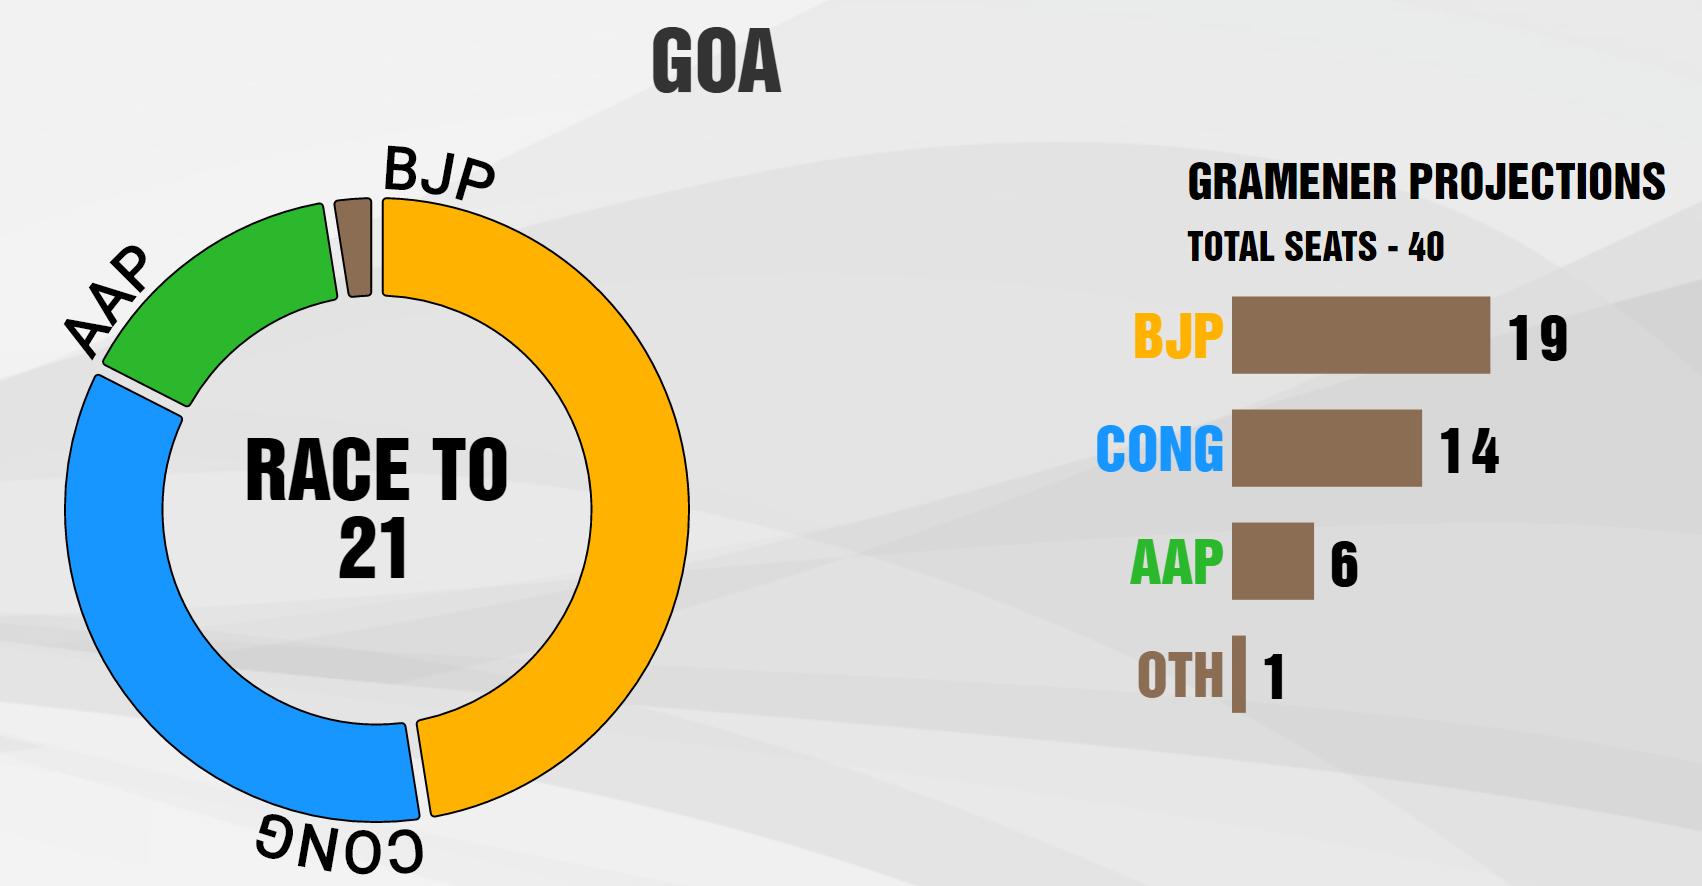 network18-gramener-projections-goa